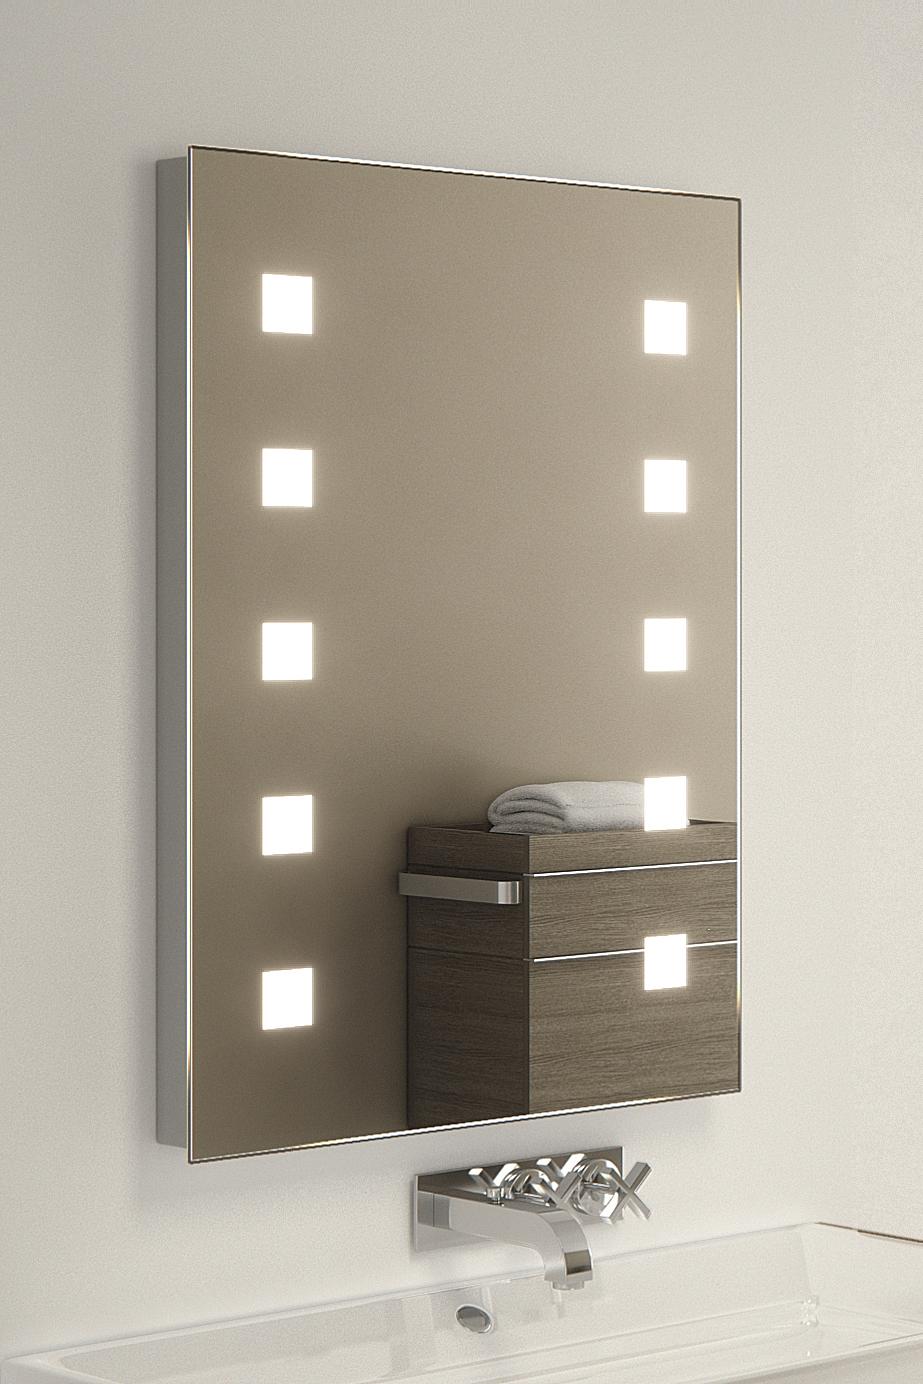 Bathroom Mirrors Illuminated: Nanban Shaver LED Bathroom Illuminated Mirror With